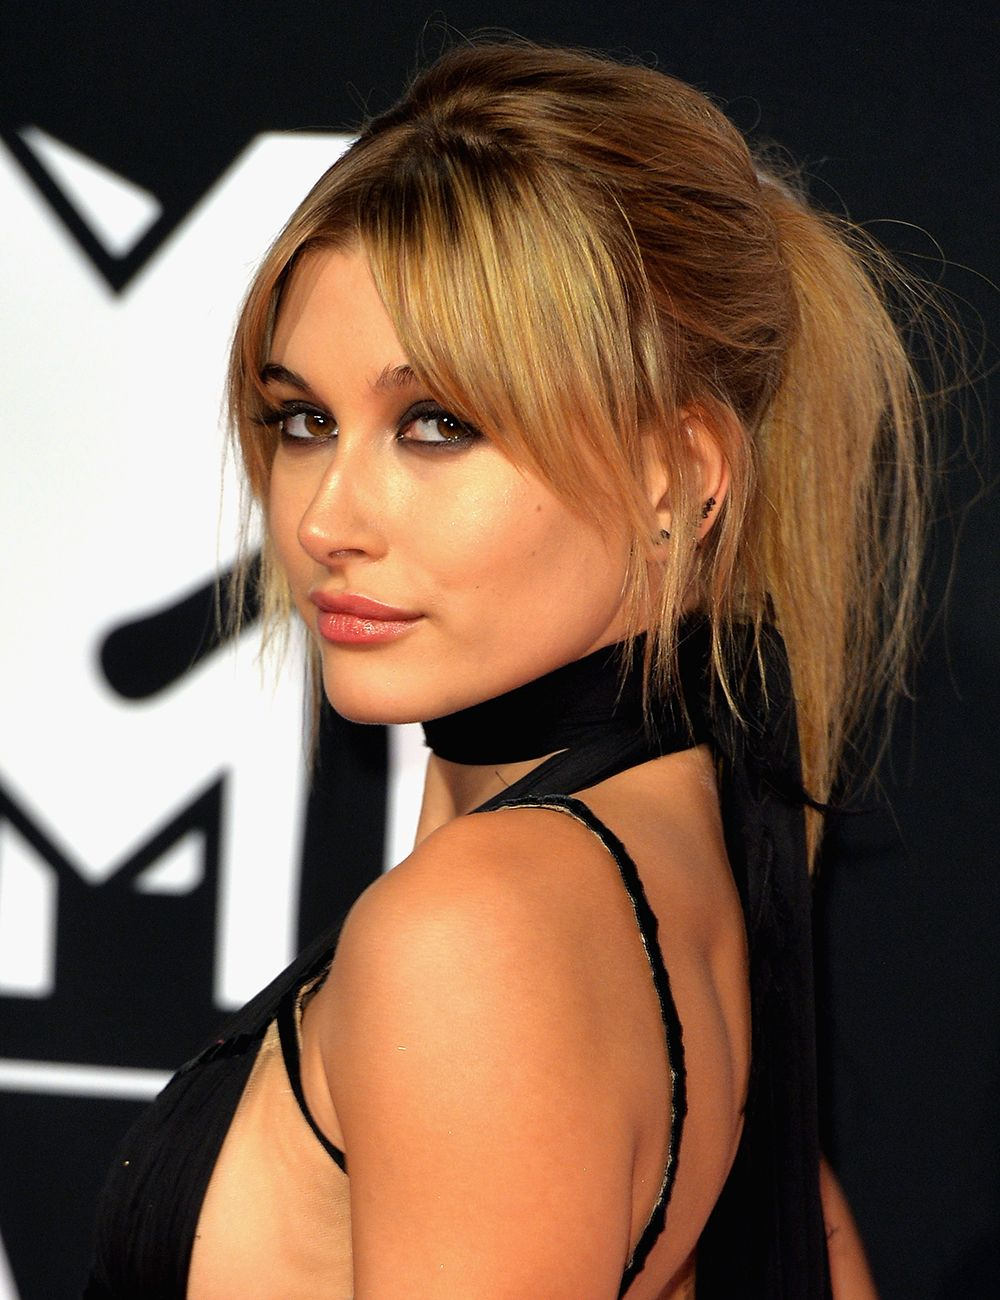 Ellie Goulding debuted mustard yellow hair at the MTV EMAs